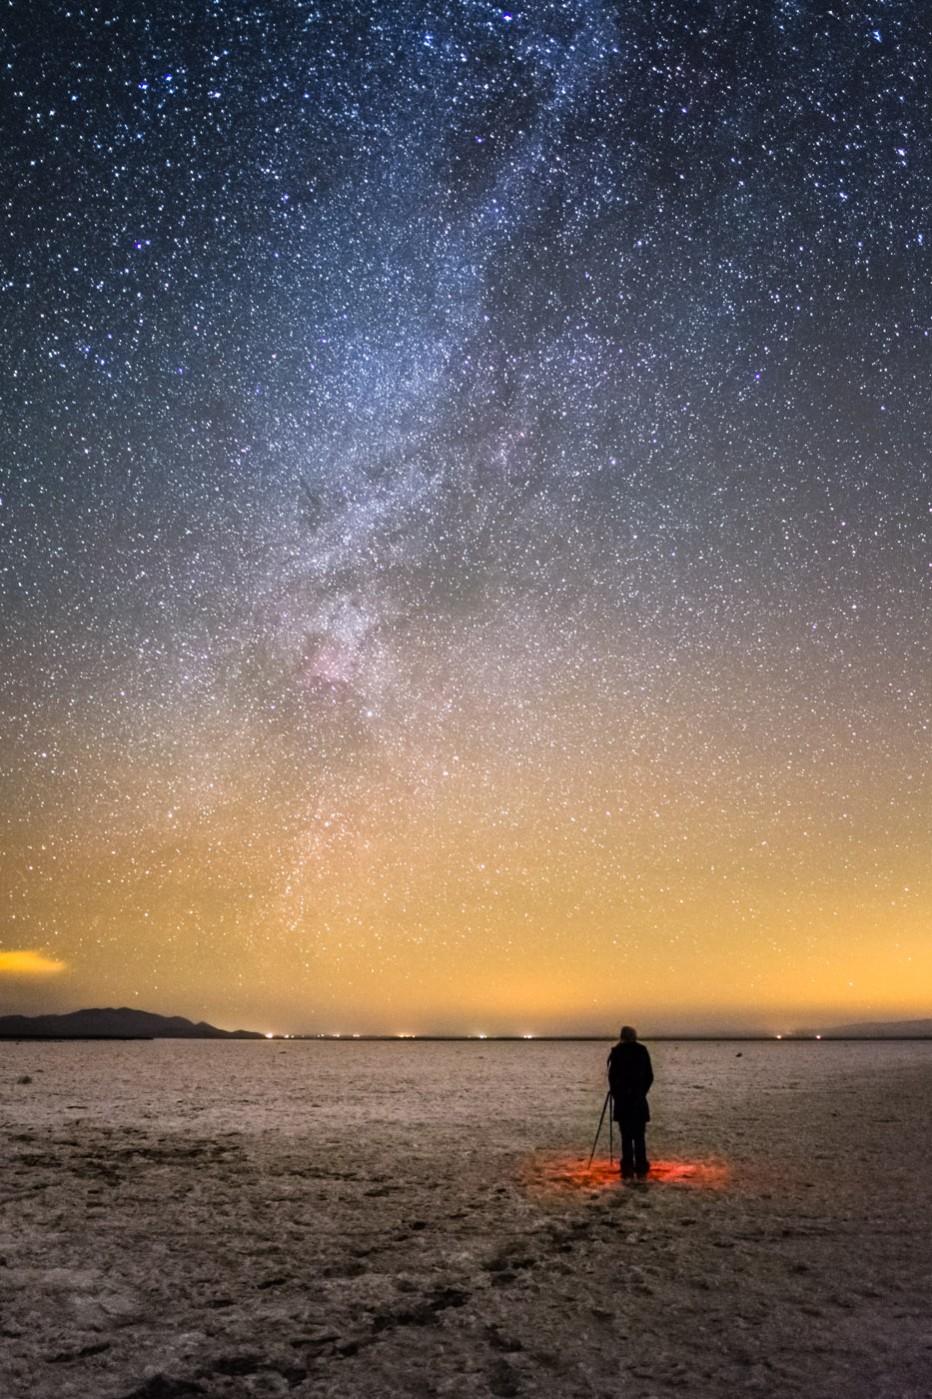 Soda Lake and the Milky Way